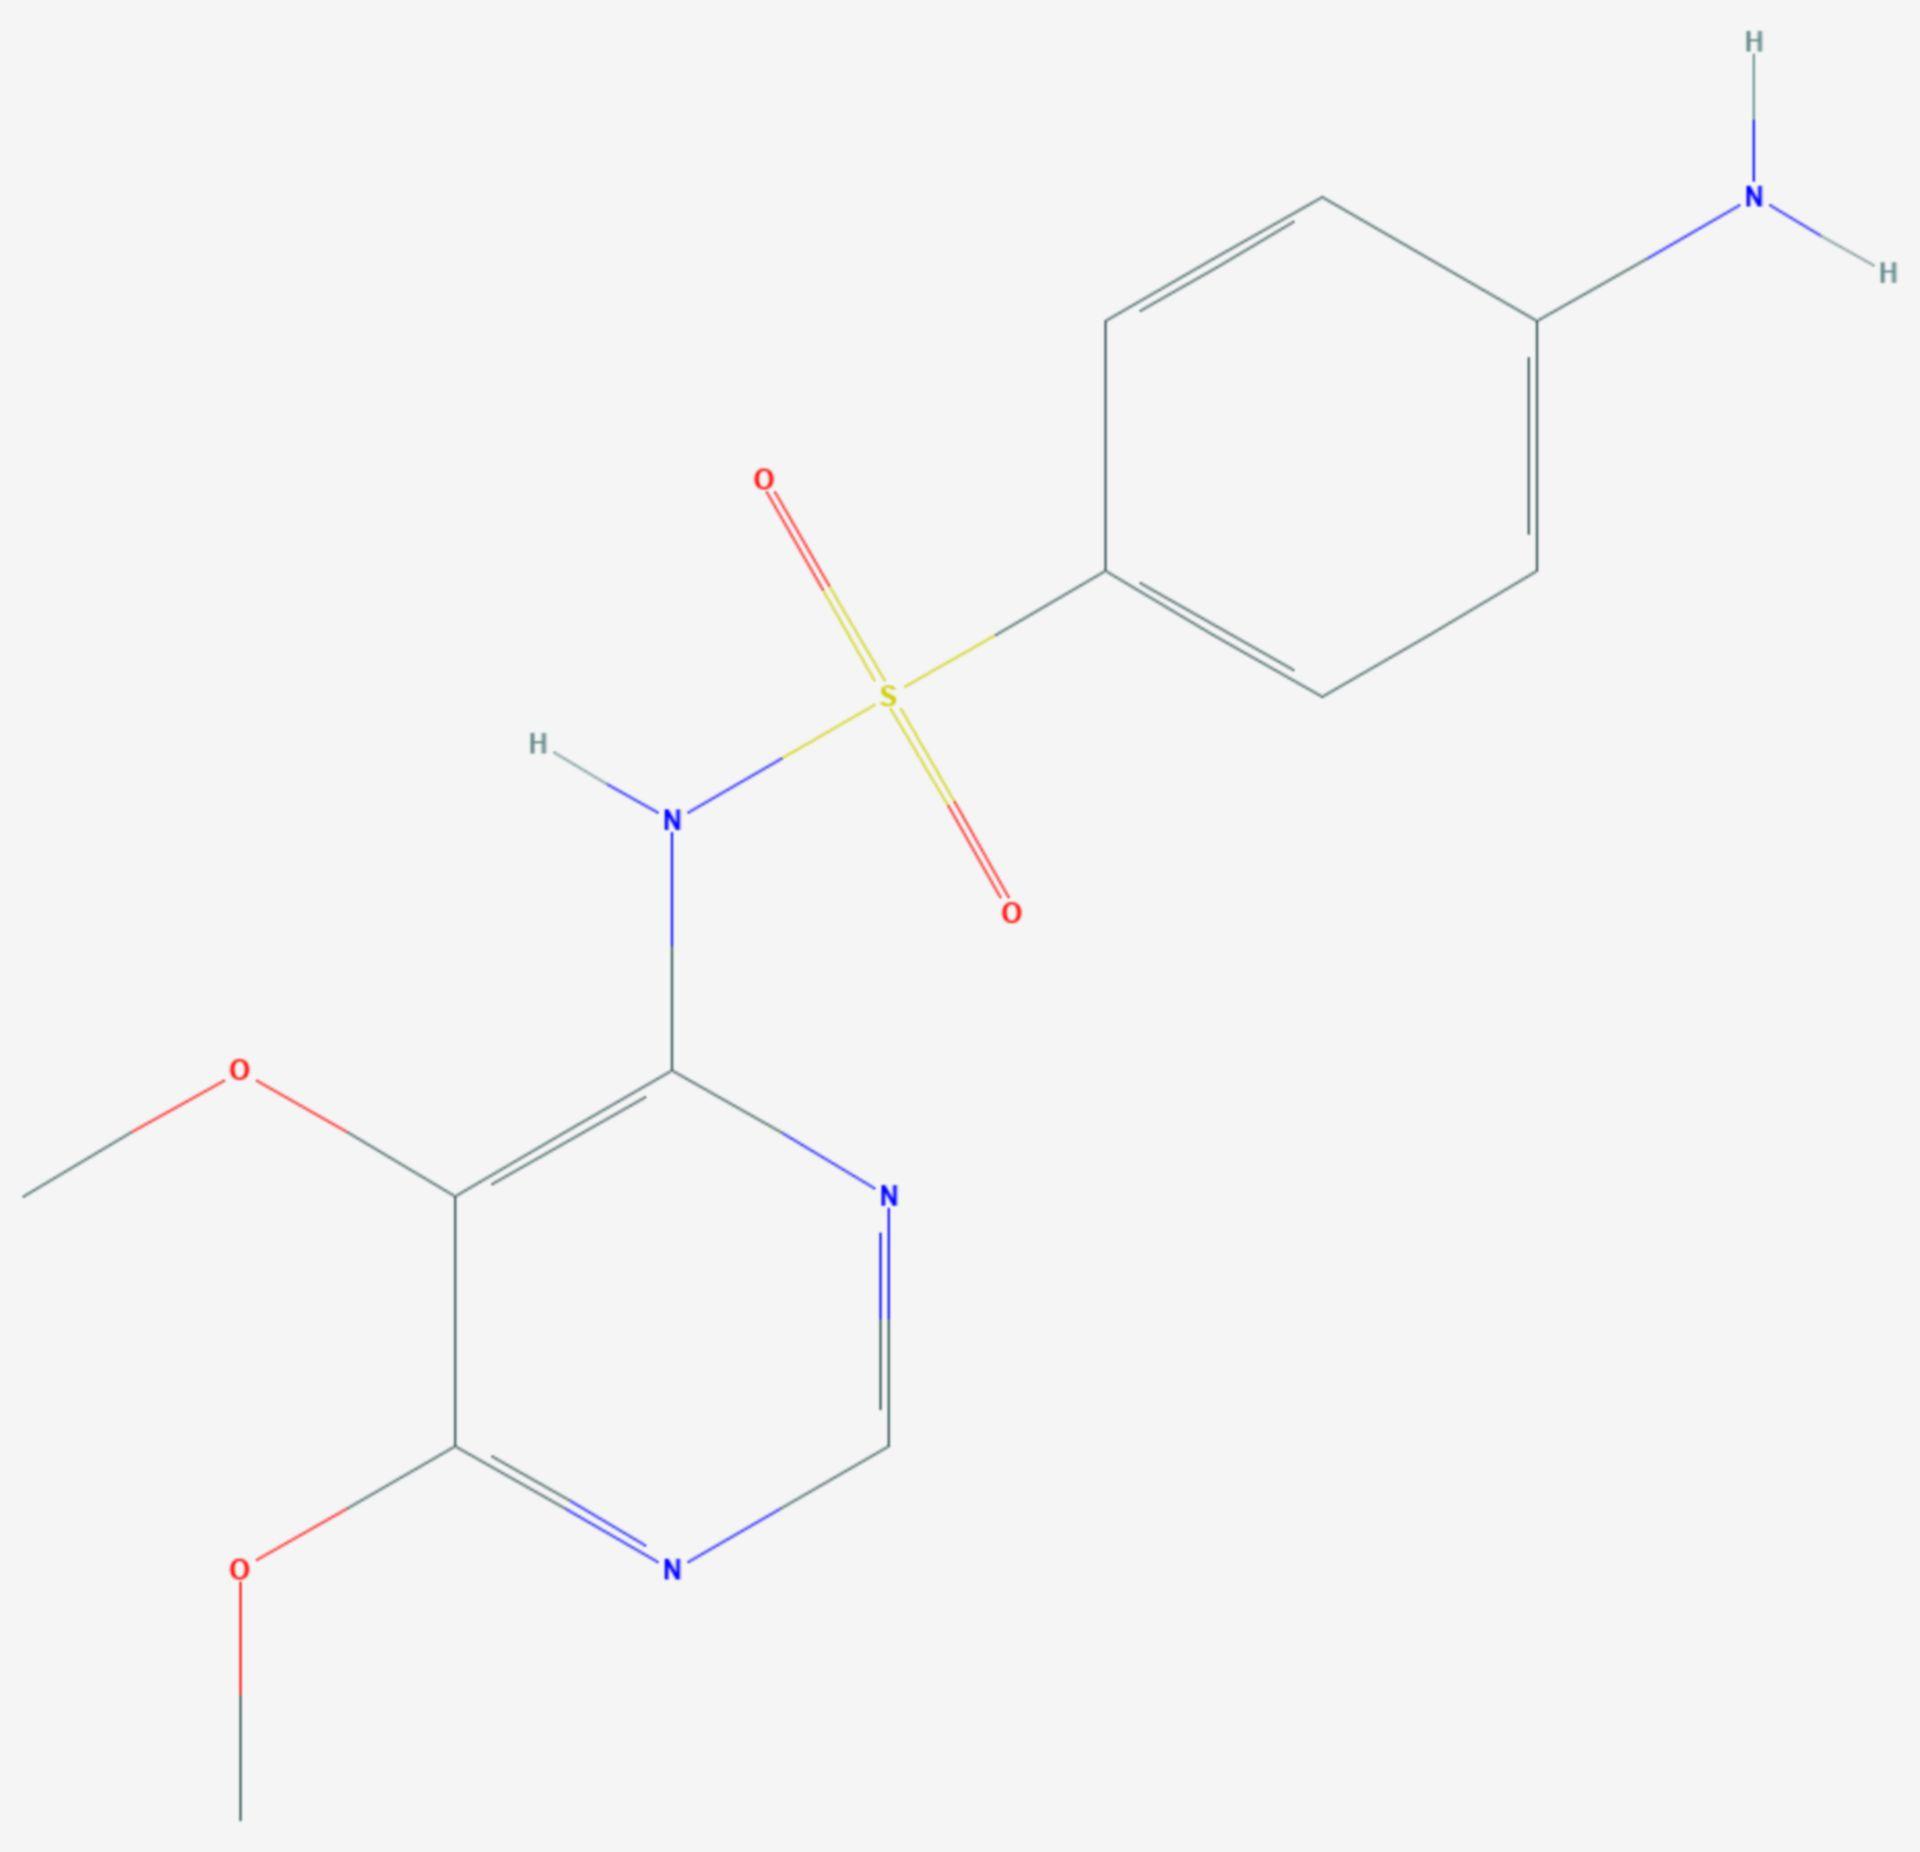 Sulfadoxin (Strukturformel)